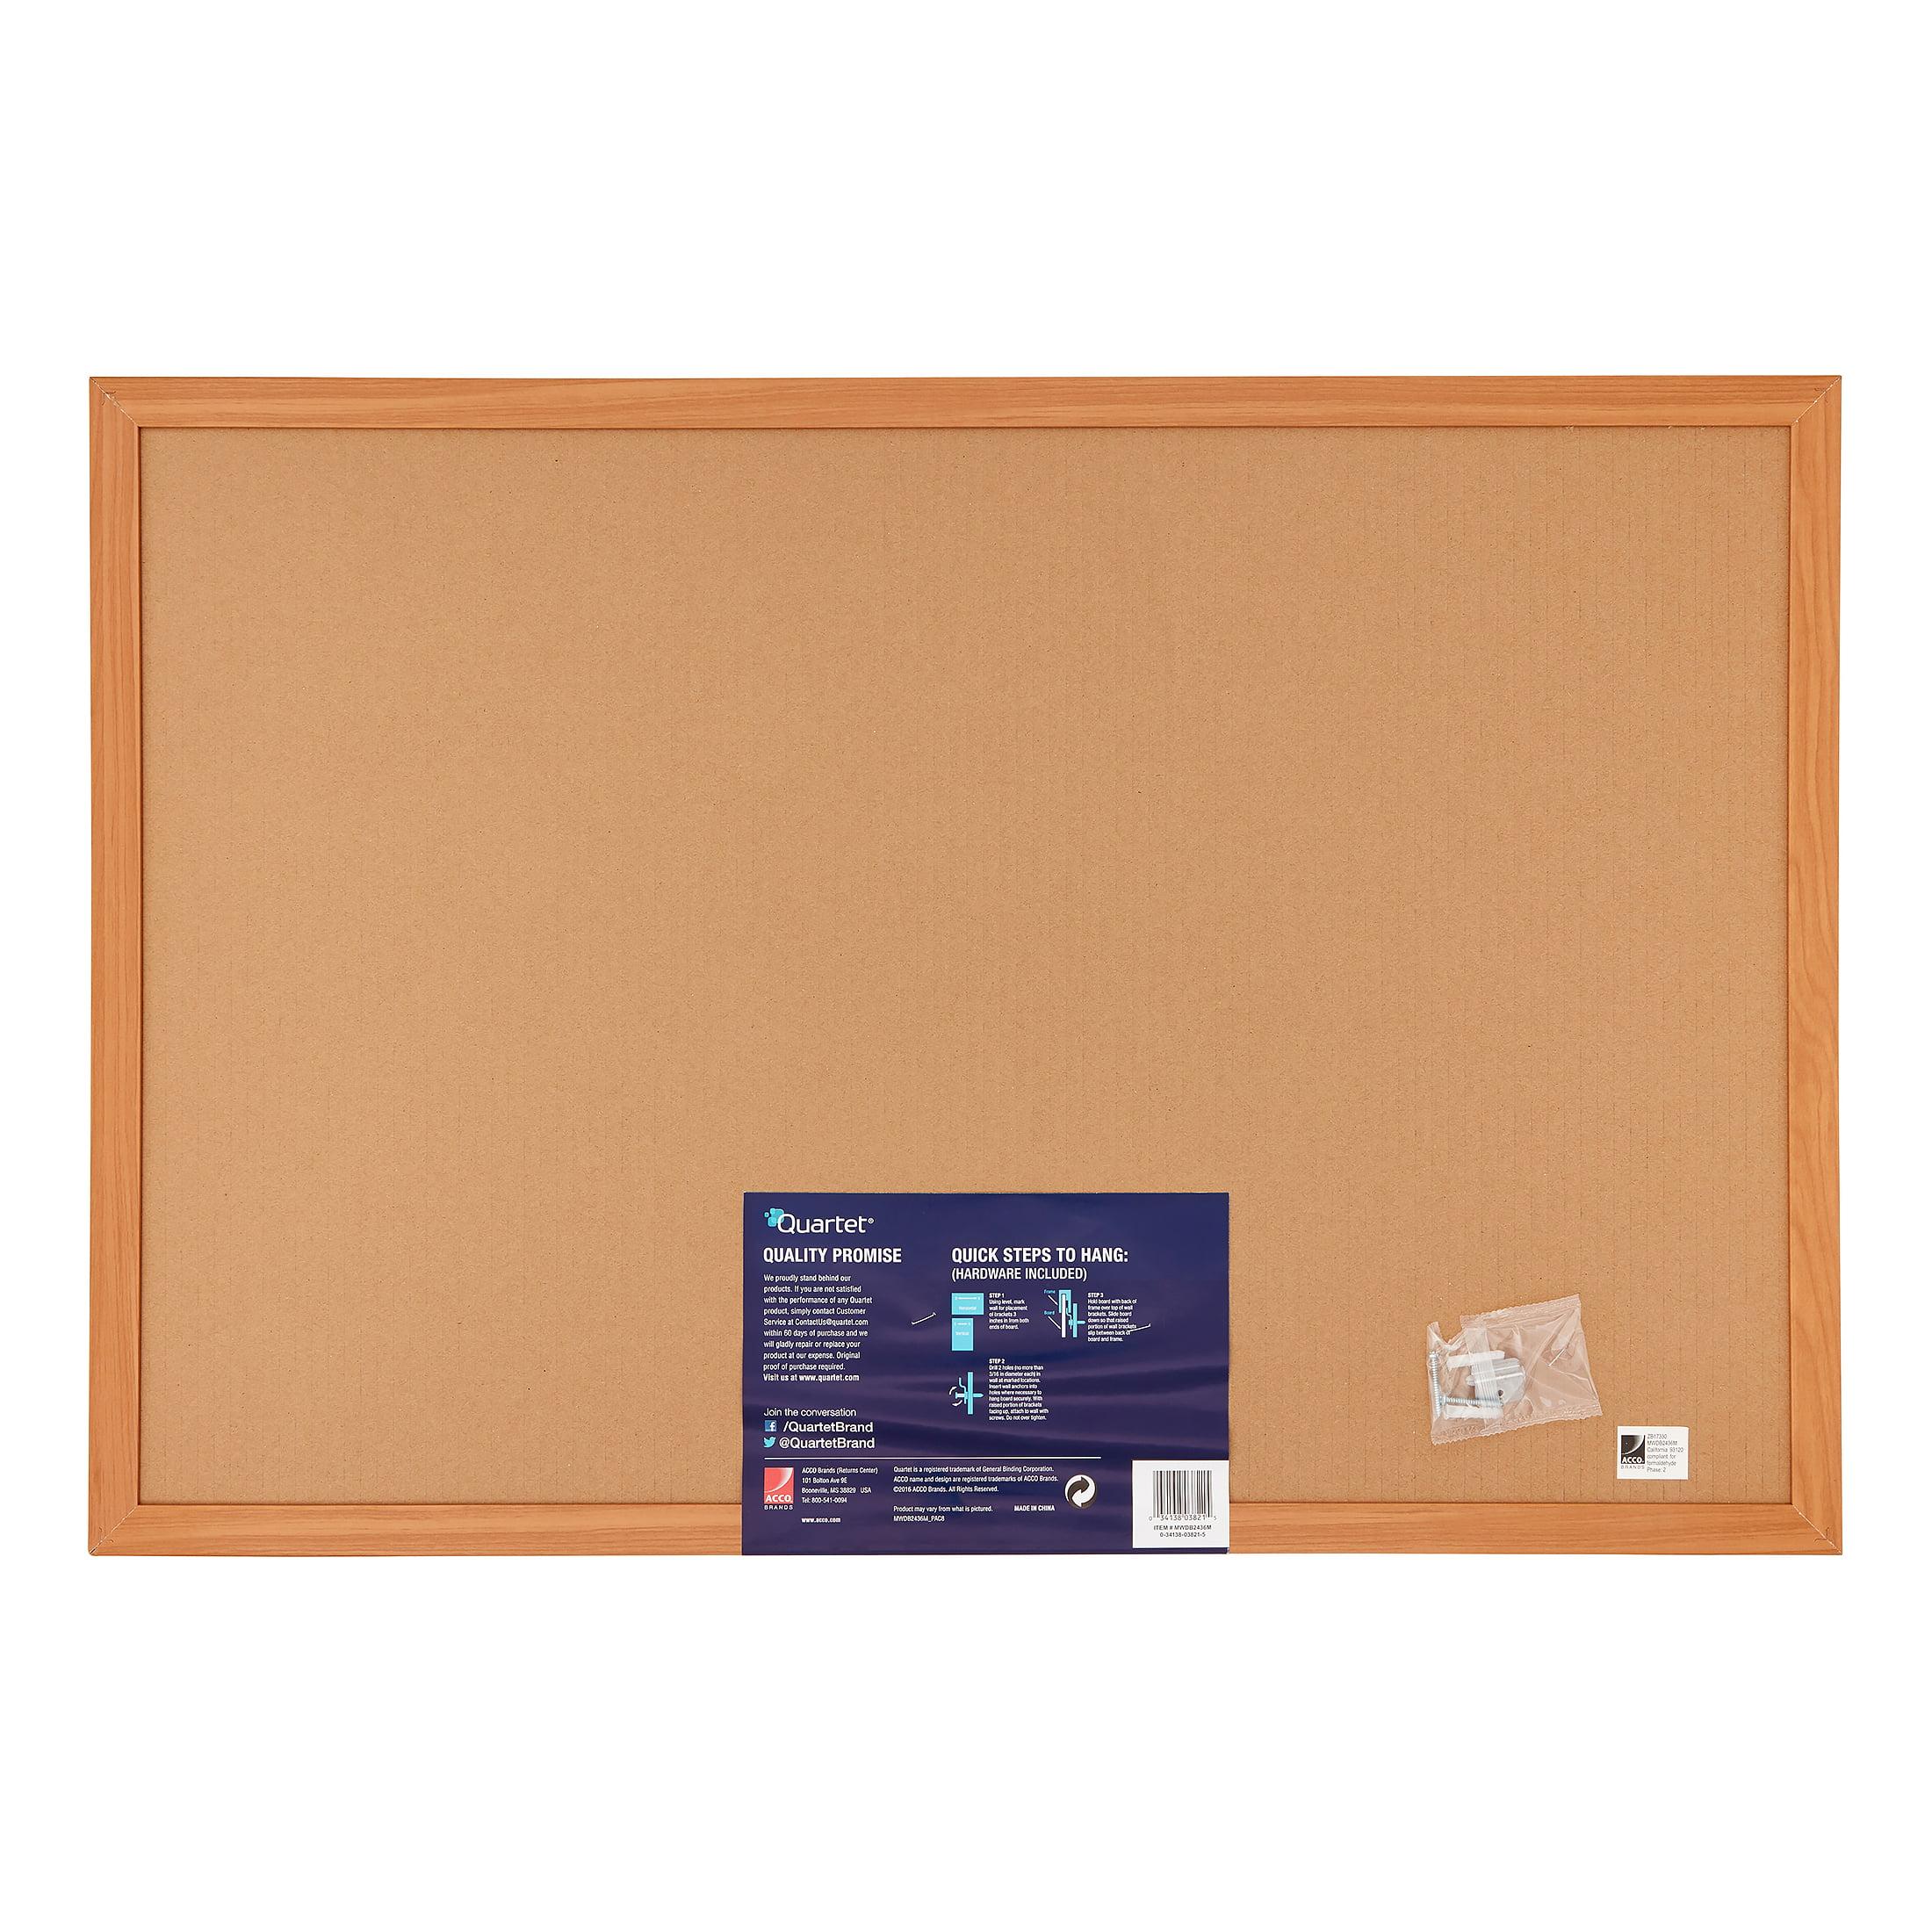 2 X Cork Board Bulletin Board in Wooden Frame 50x70 CM NEW